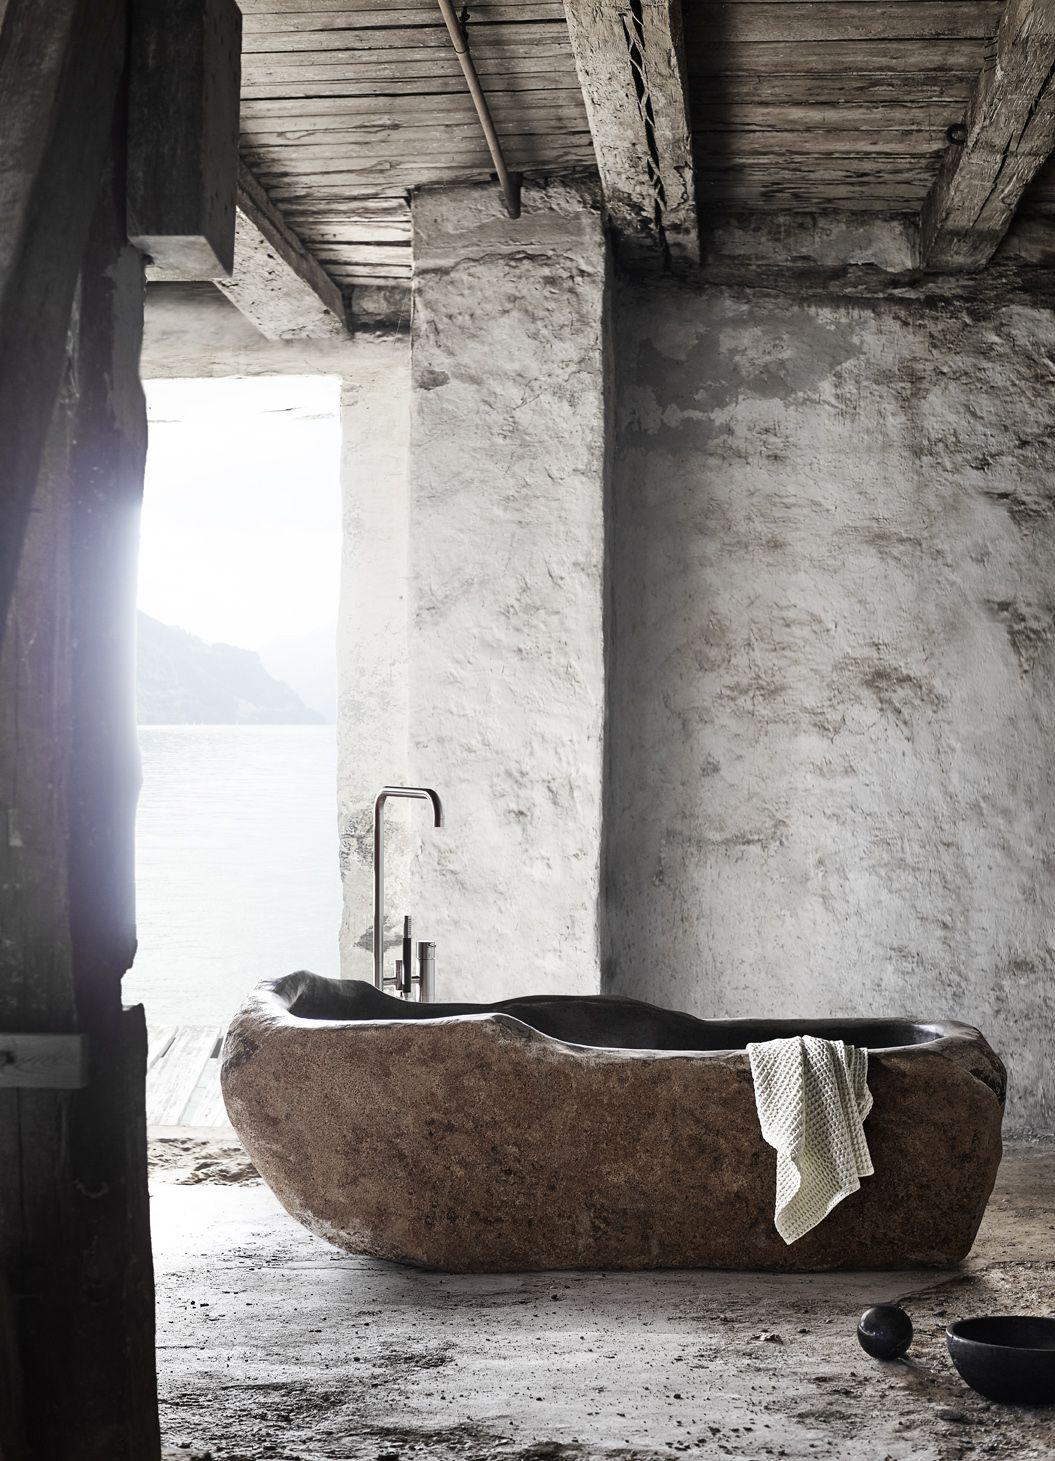 Tags rustic bathroom natural minimal monochrome - Home Decor Wabi Sabi Stone Bathroomrustic